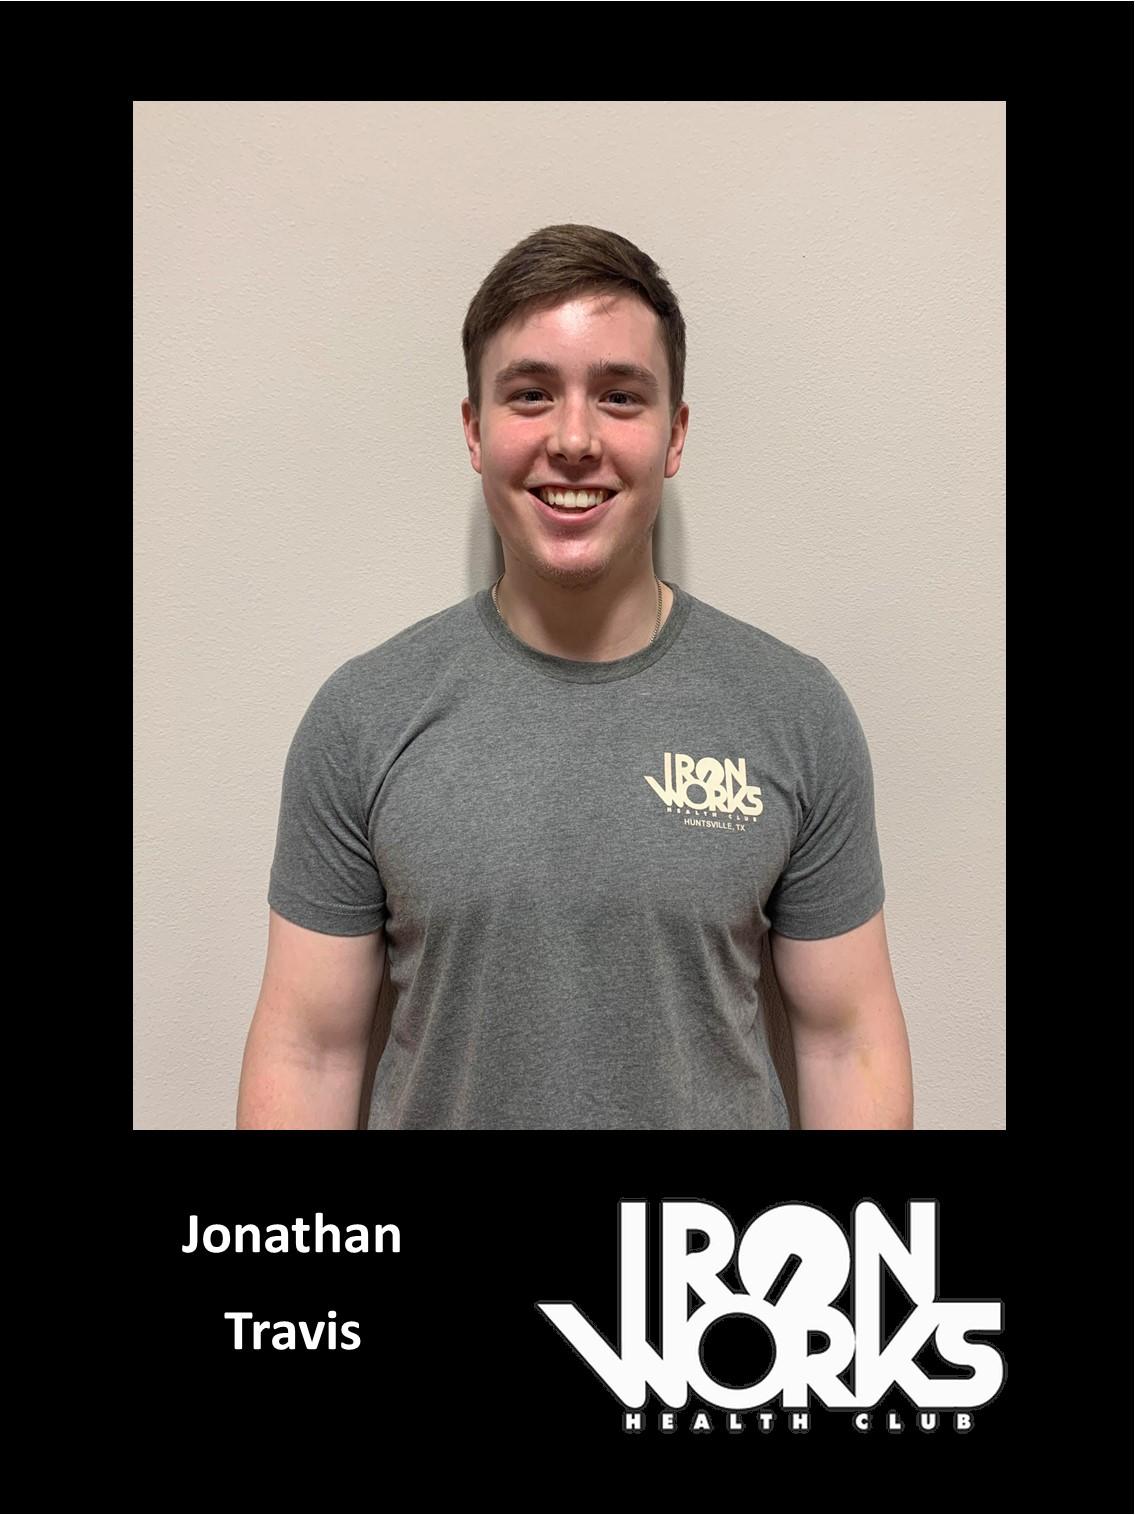 Jonathan Travis